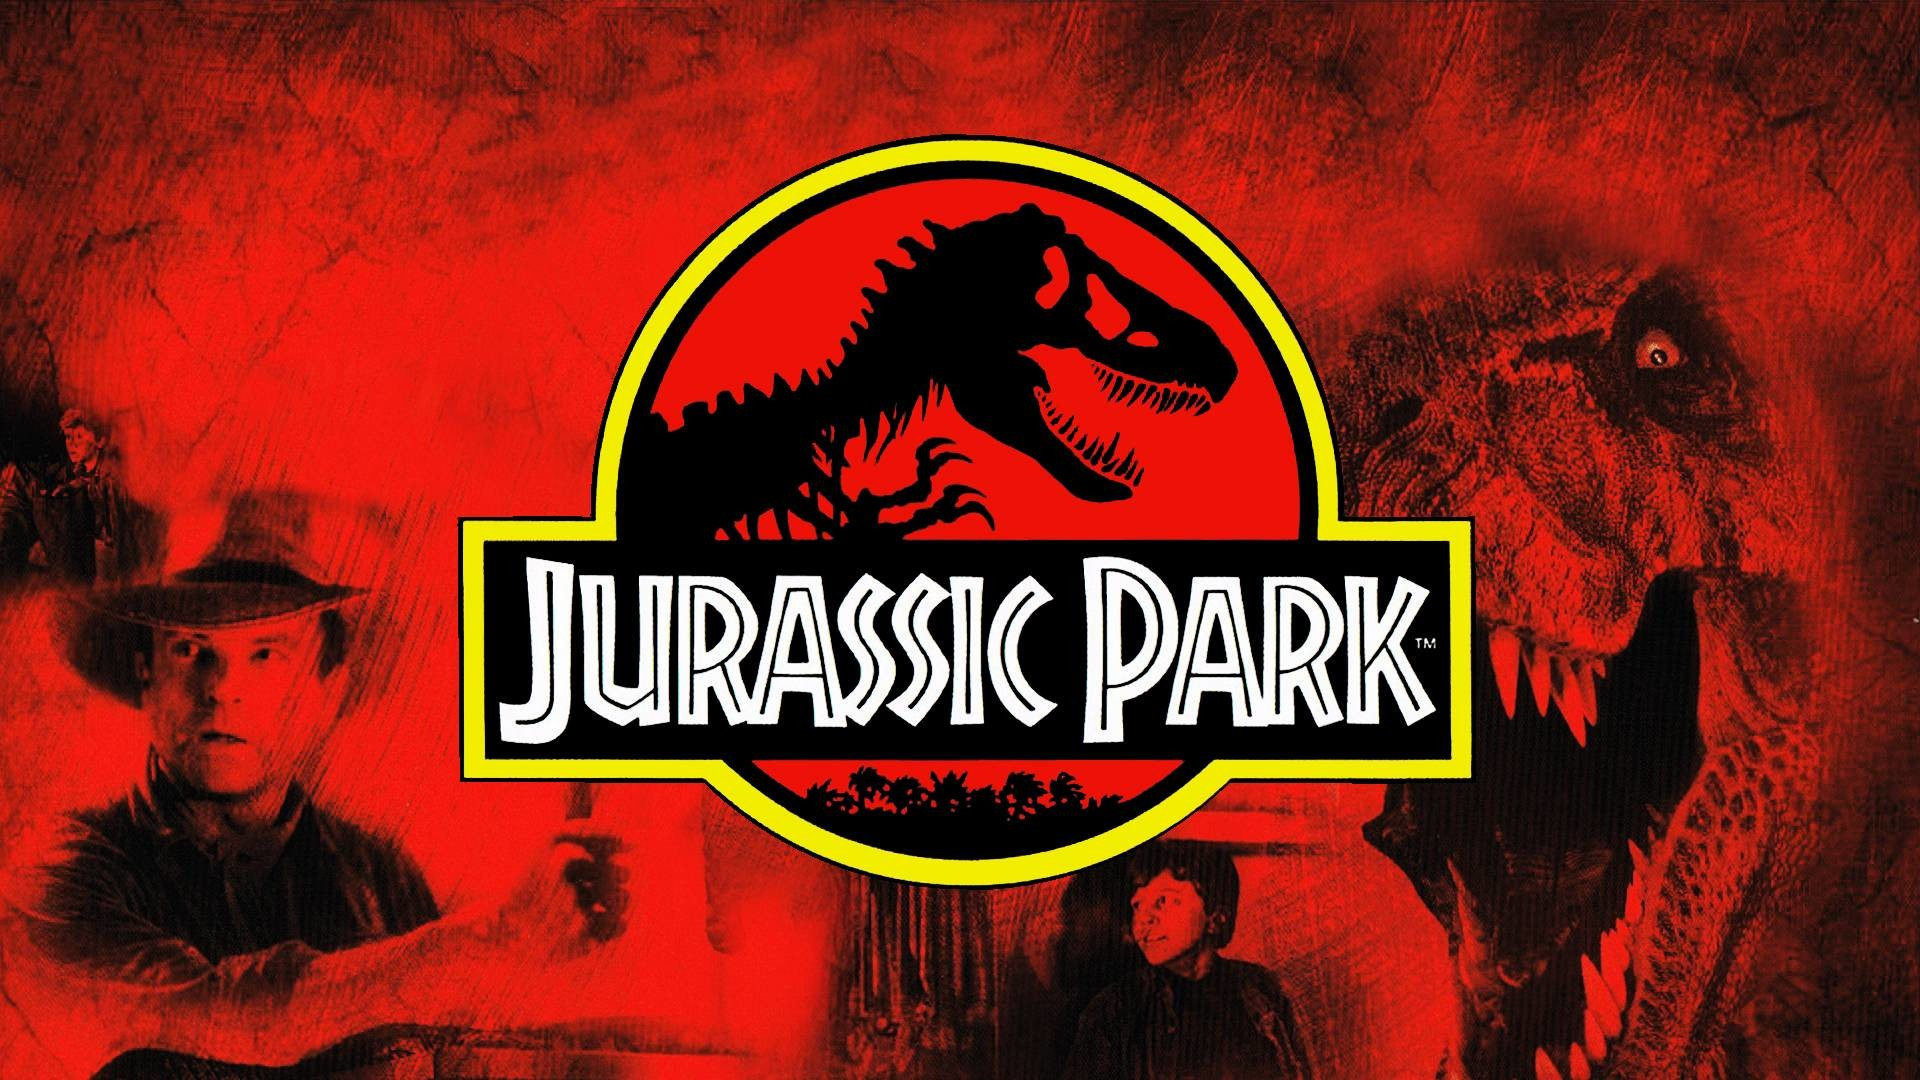 Juressic Park